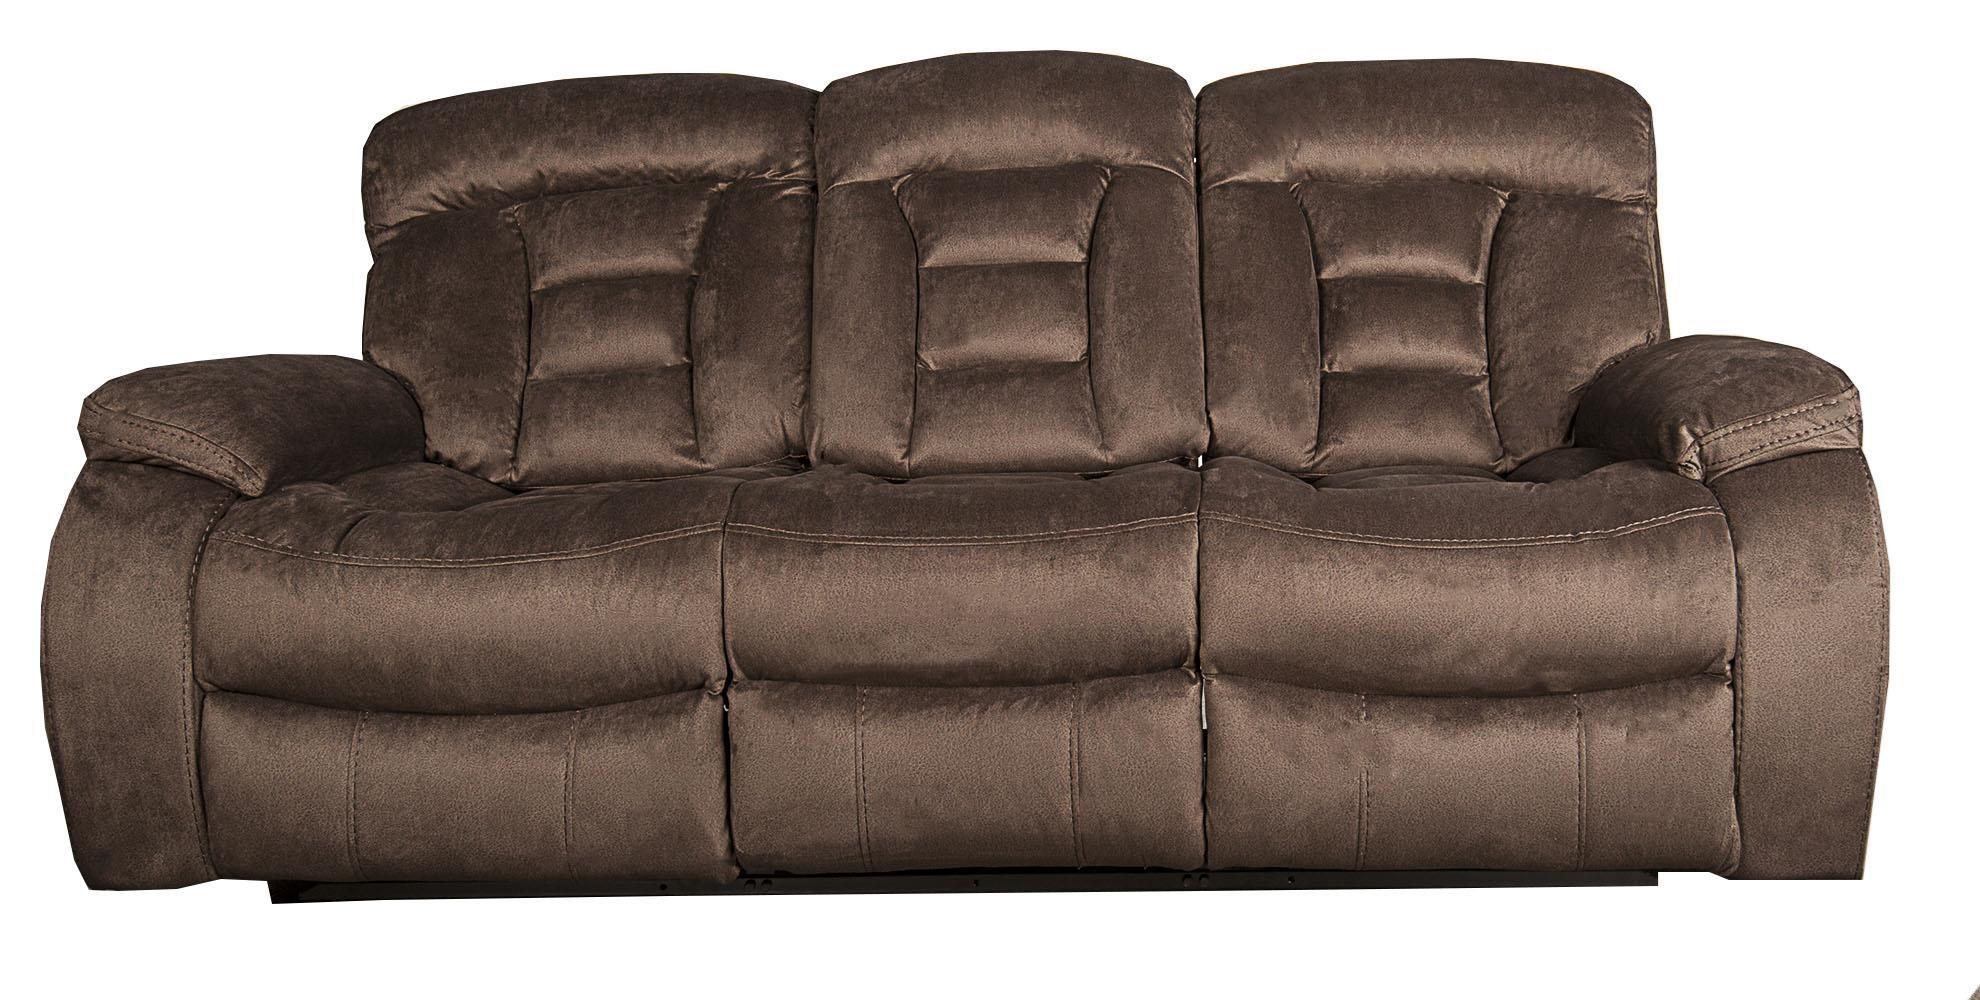 Morris Home Furnishings Merrick Merrick Reclining Sofa - Item Number: 649892270